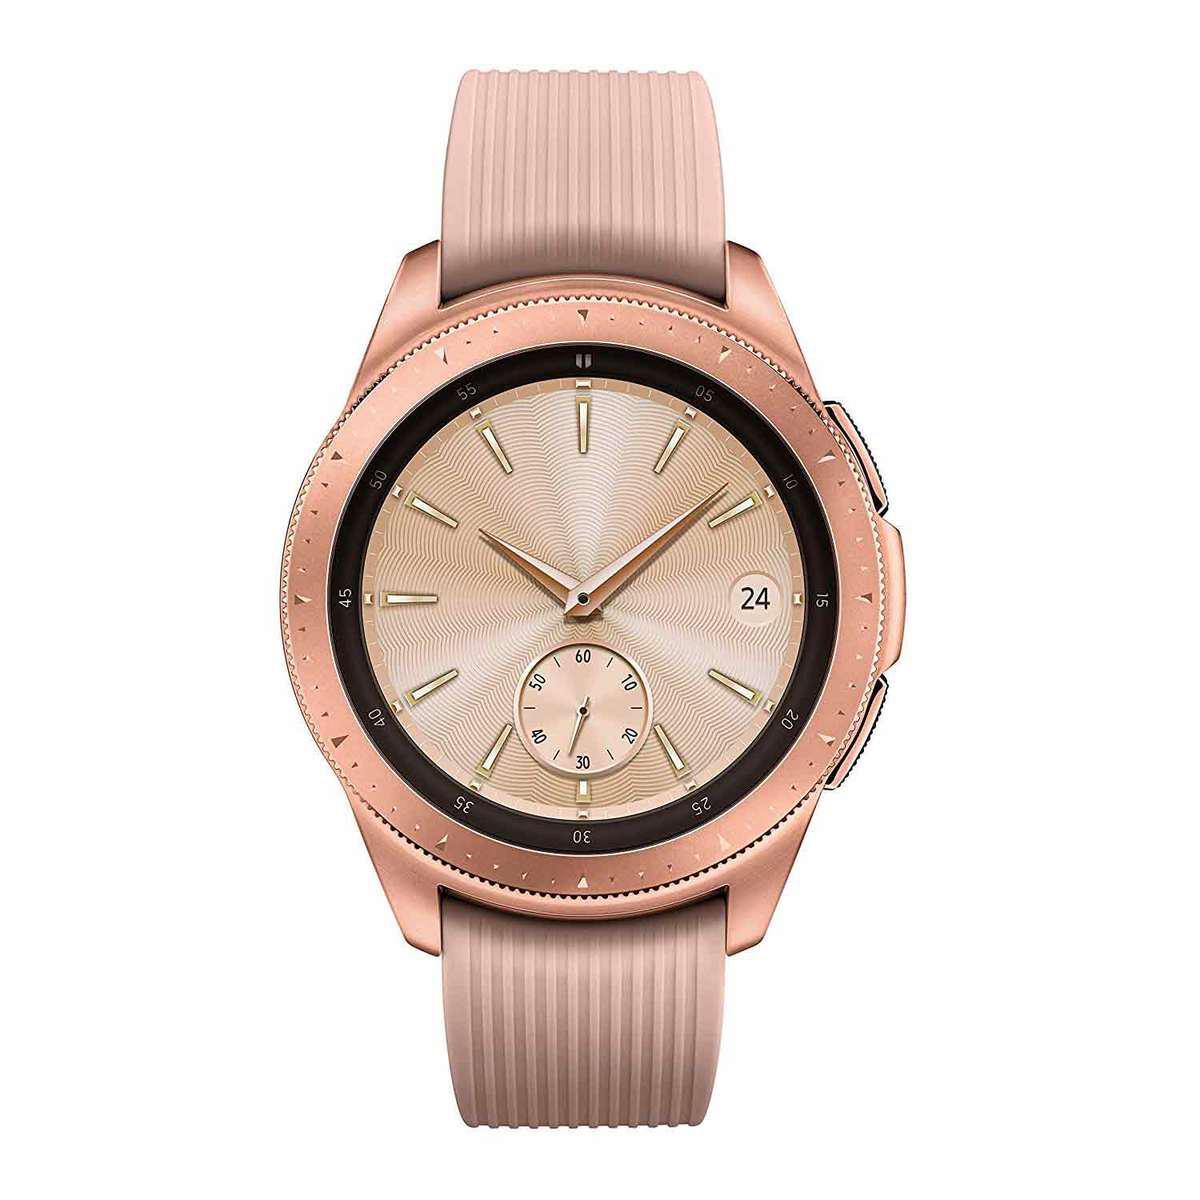 Samsung Smart Watch Galaxy Watch 42mm (SM-R810) HR GPS - Roséguld